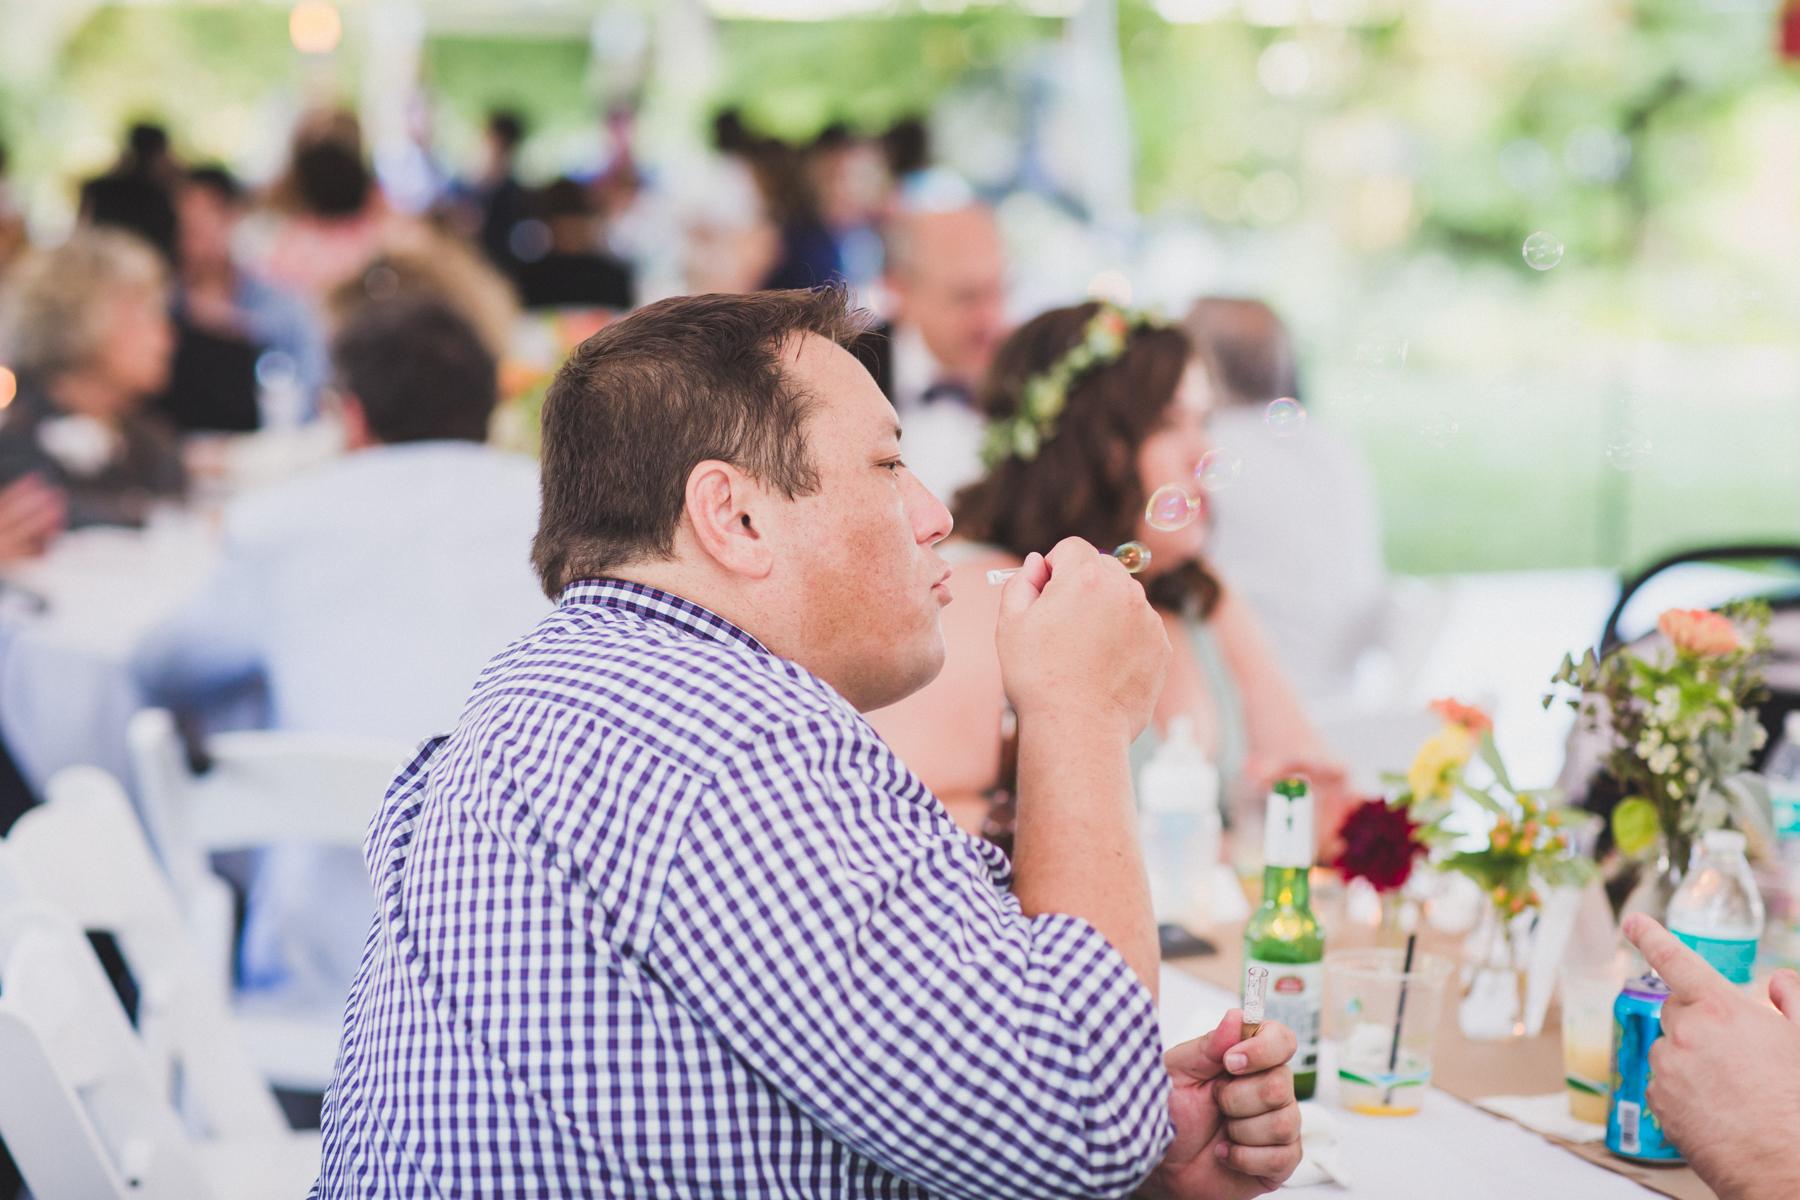 Long-Island-Documentary-Wedding-Photography-Summer-Tent-Wedding-in-New-York-110.jpg